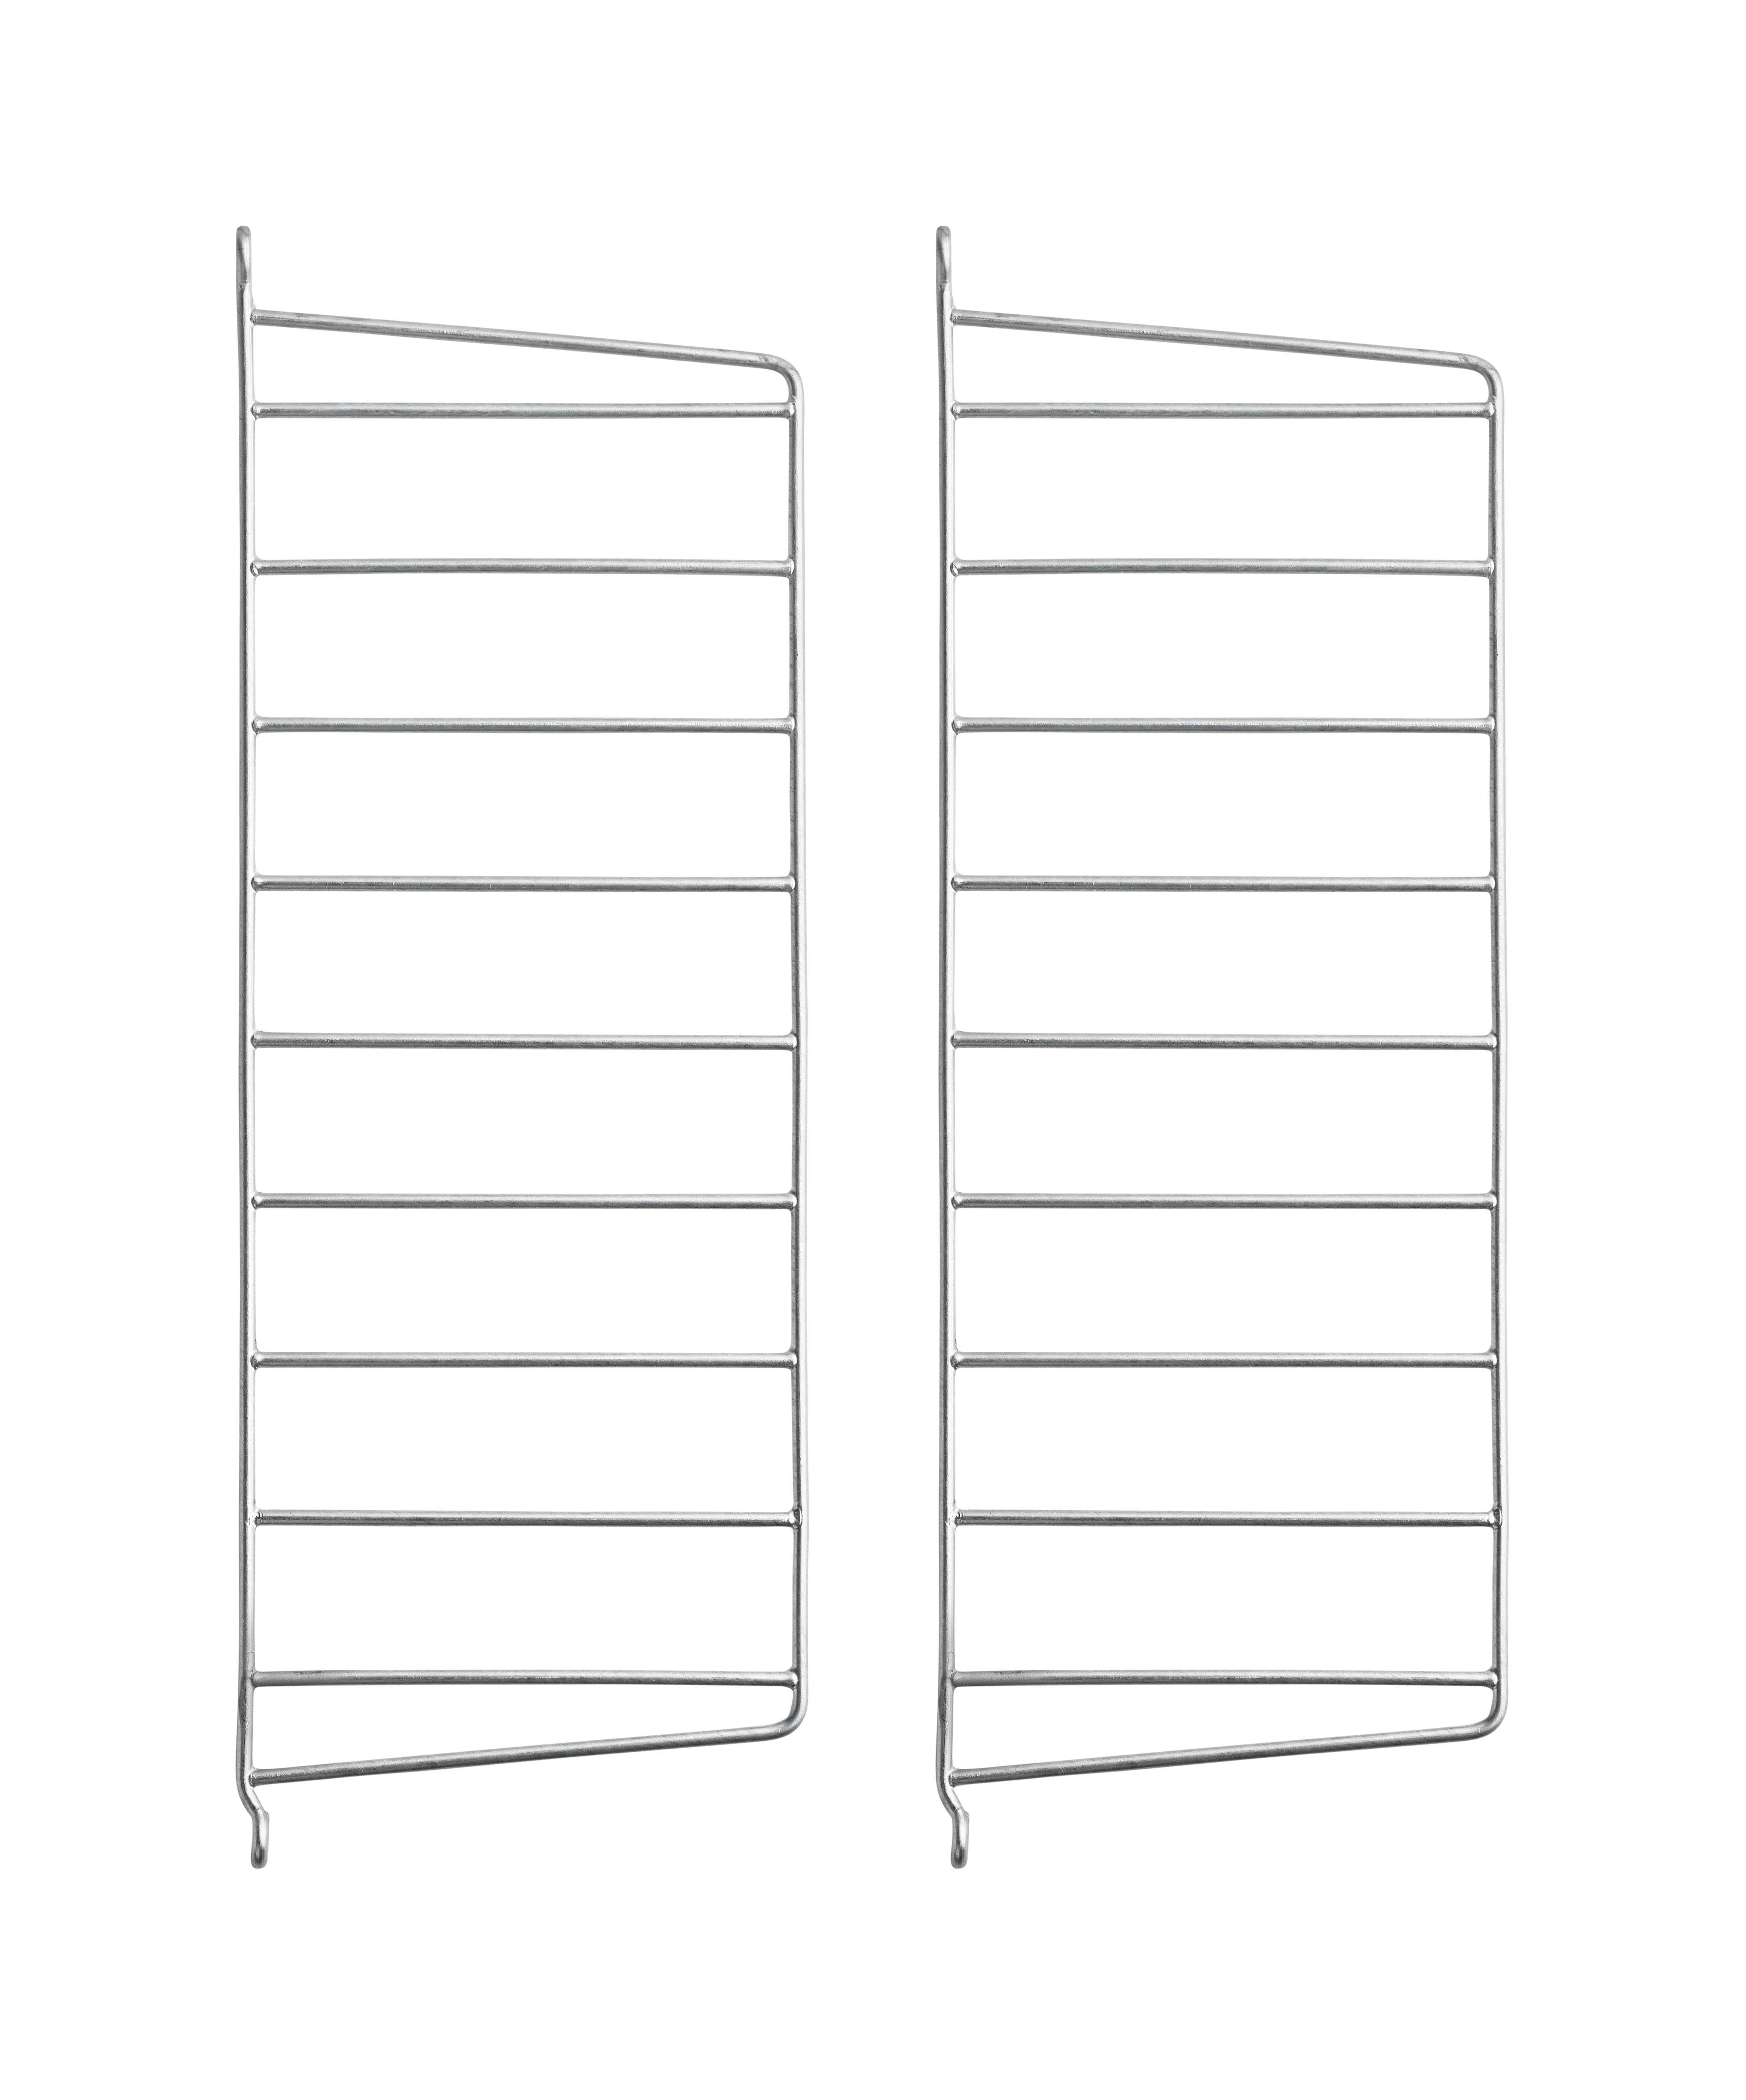 Arredamento - Scaffali e librerie - Montante murale String Outdoor - / Acciaio zincato - H 50 x P 20 cm - Set da 2 di String Furniture - Set da 2 / Zincato - Acciaio galvanizzato